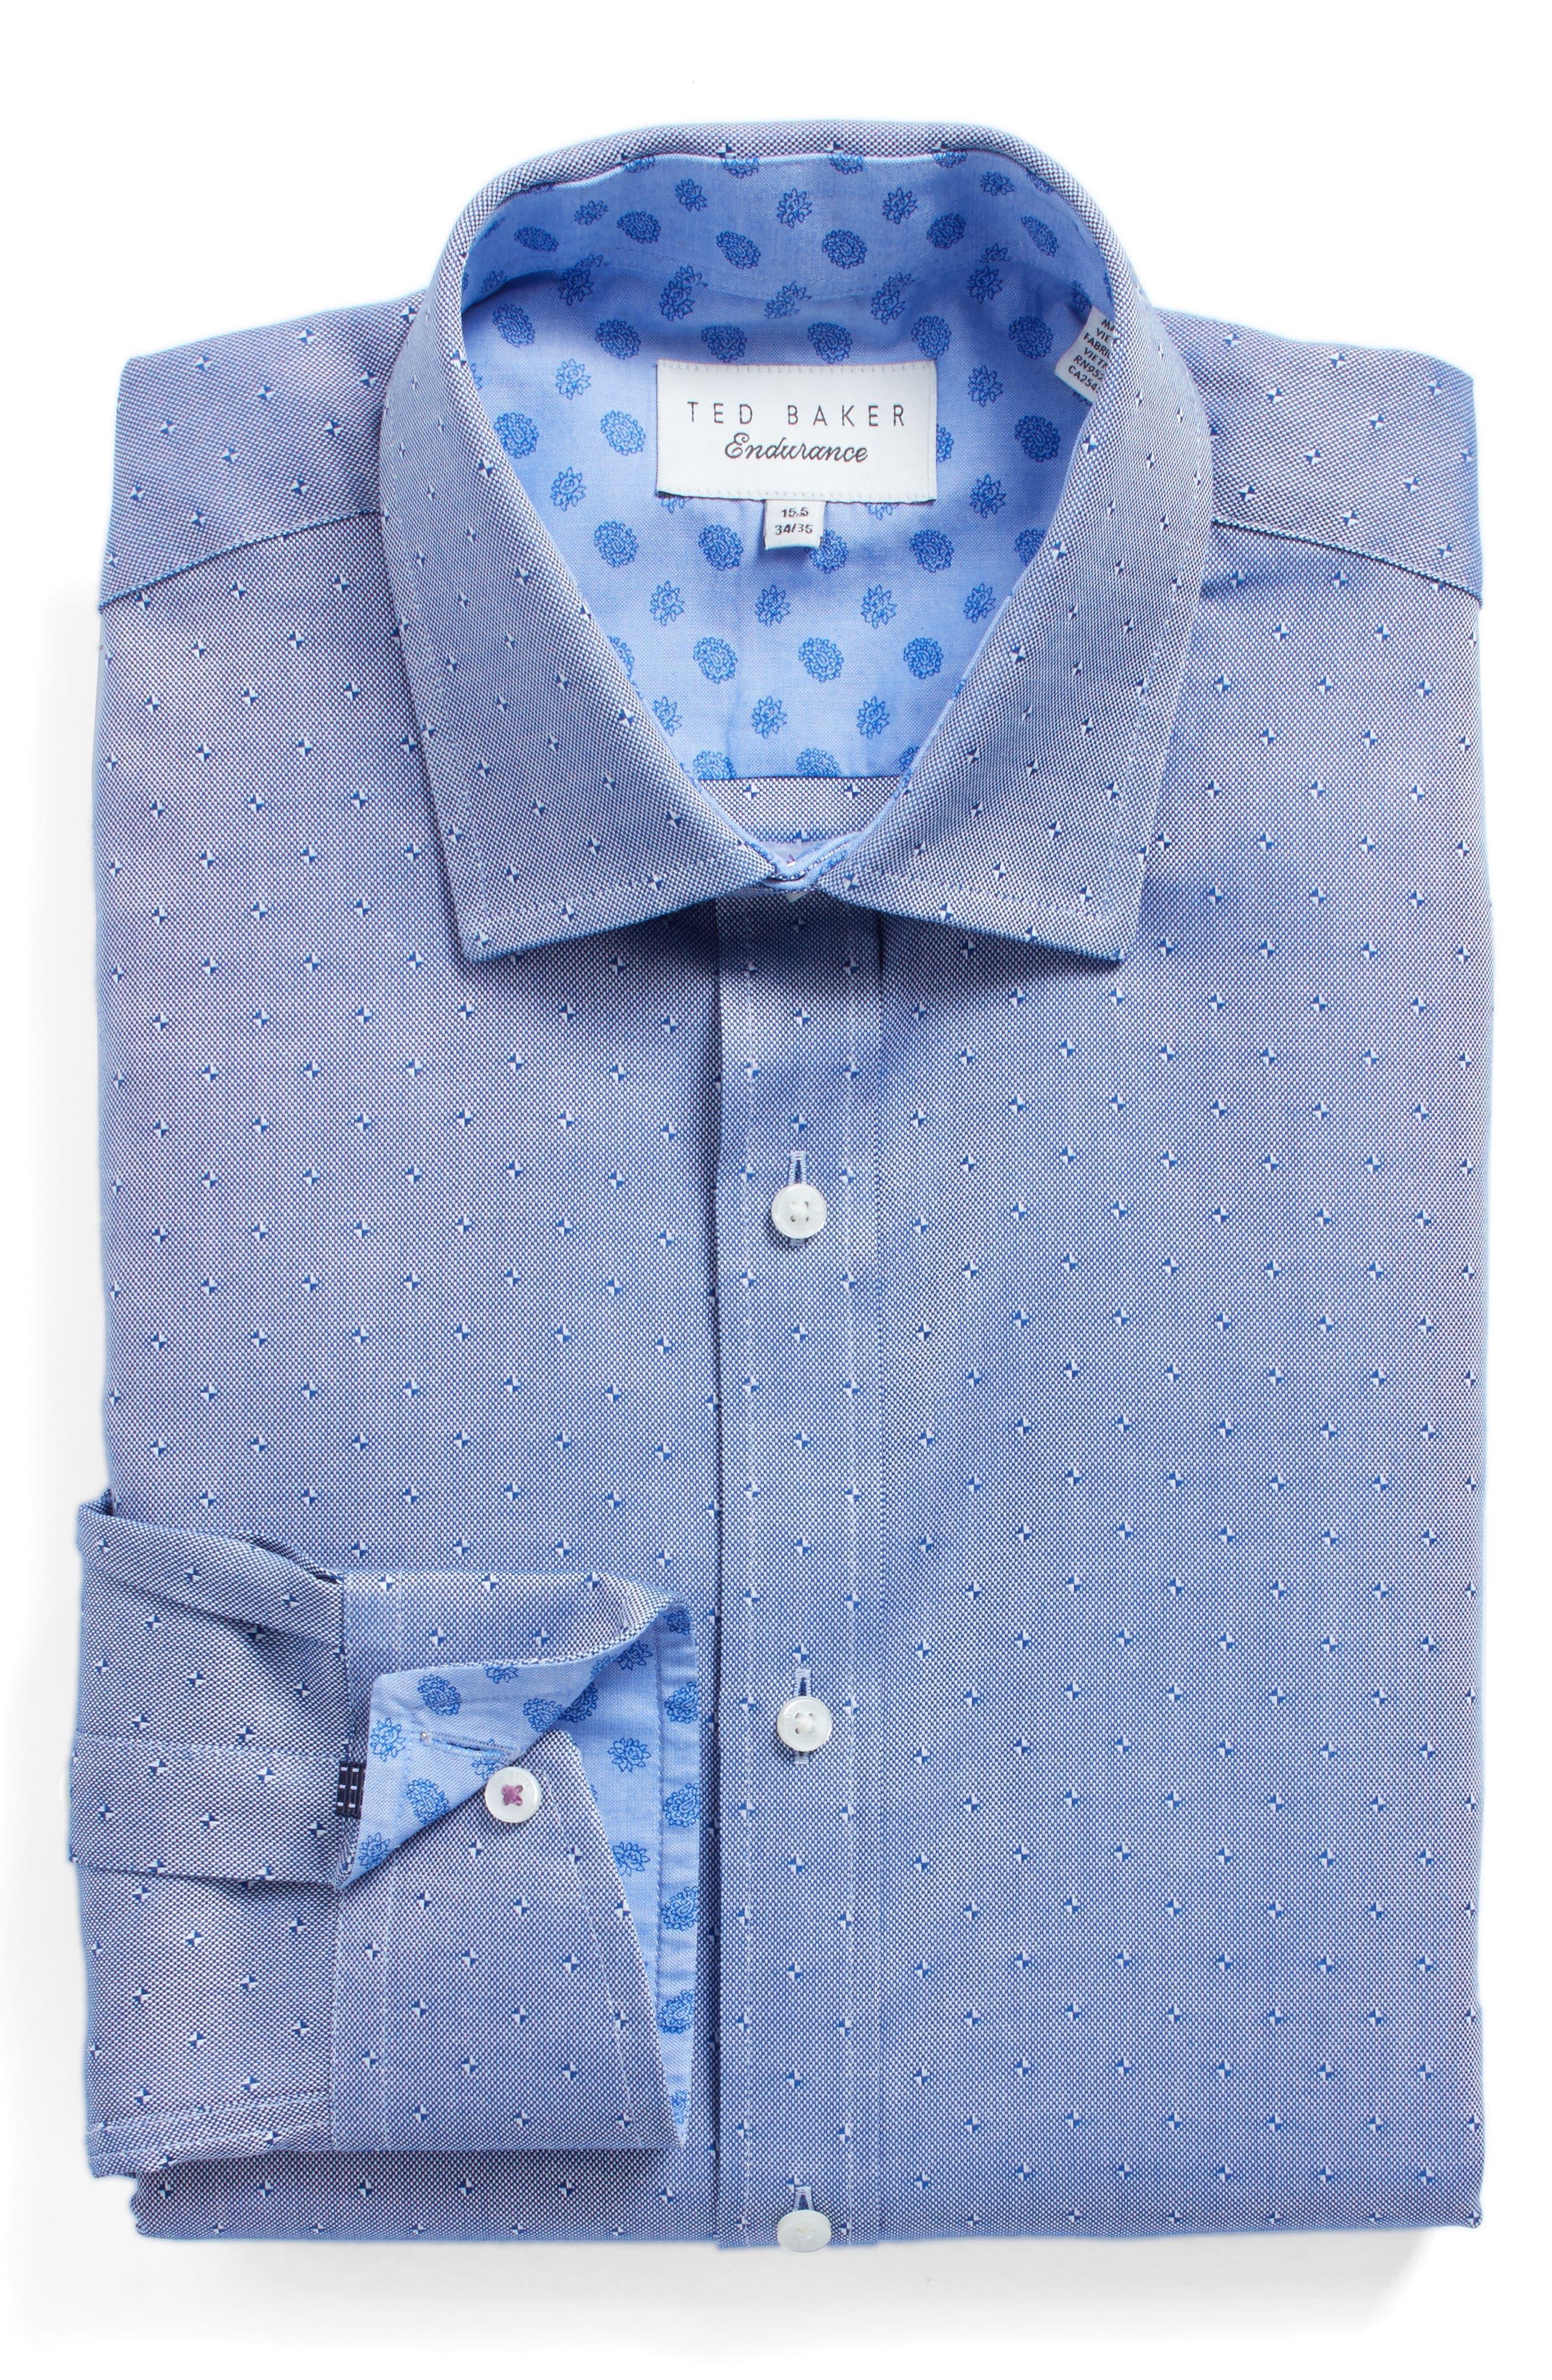 Jamer Trim Fit Dot Dress Shirt,                         Main,                         color, Navy